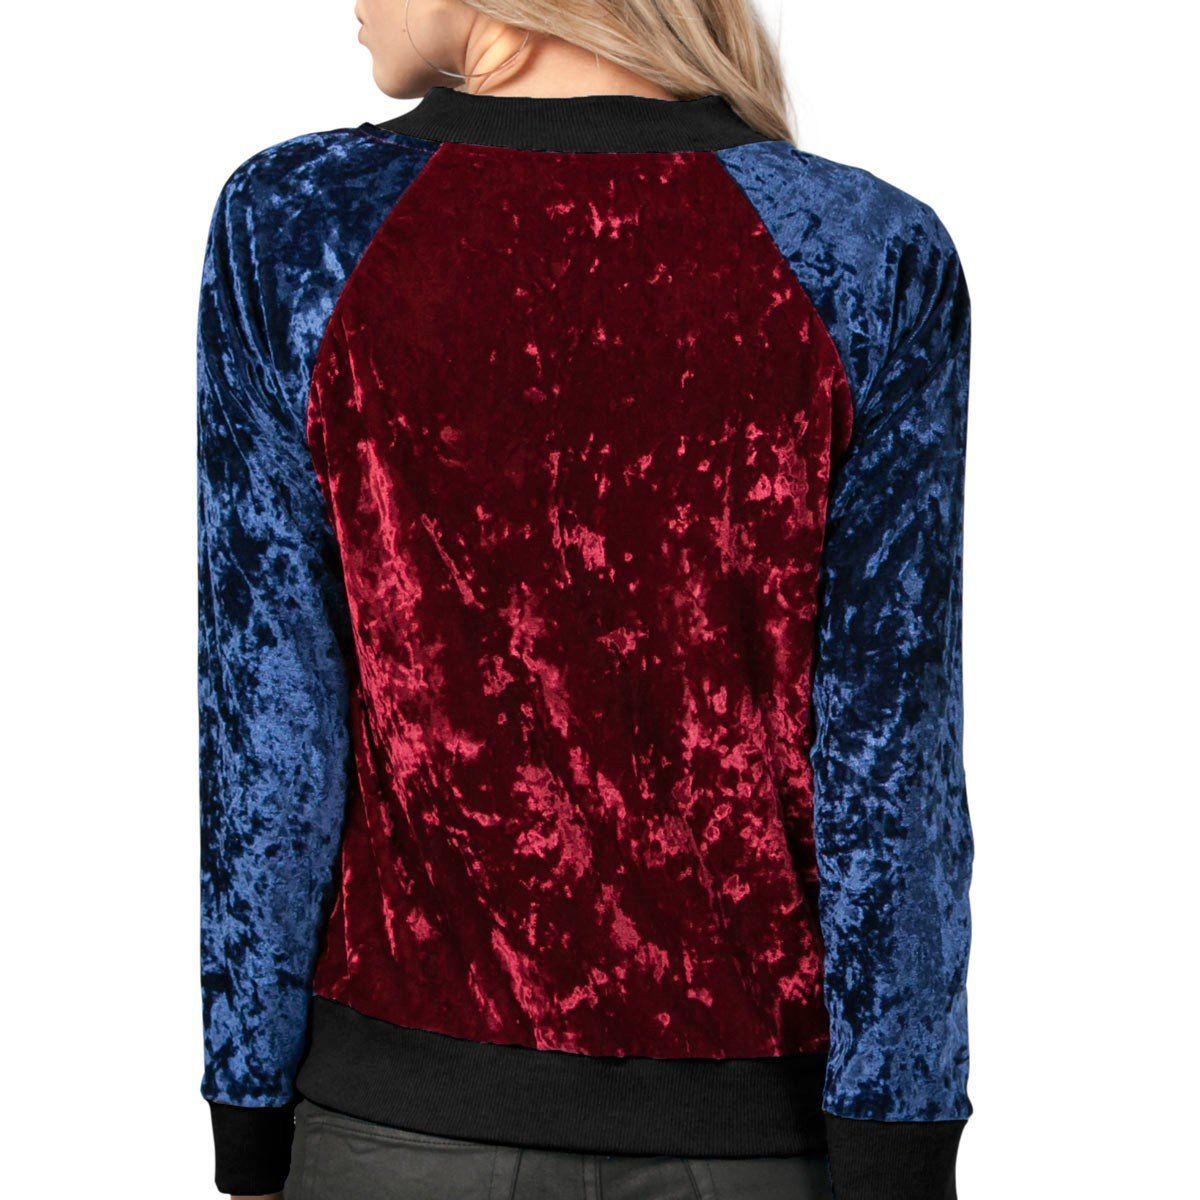 Jaqueta de veludo Mulher Maravilha  - bandUP Store Marketplace